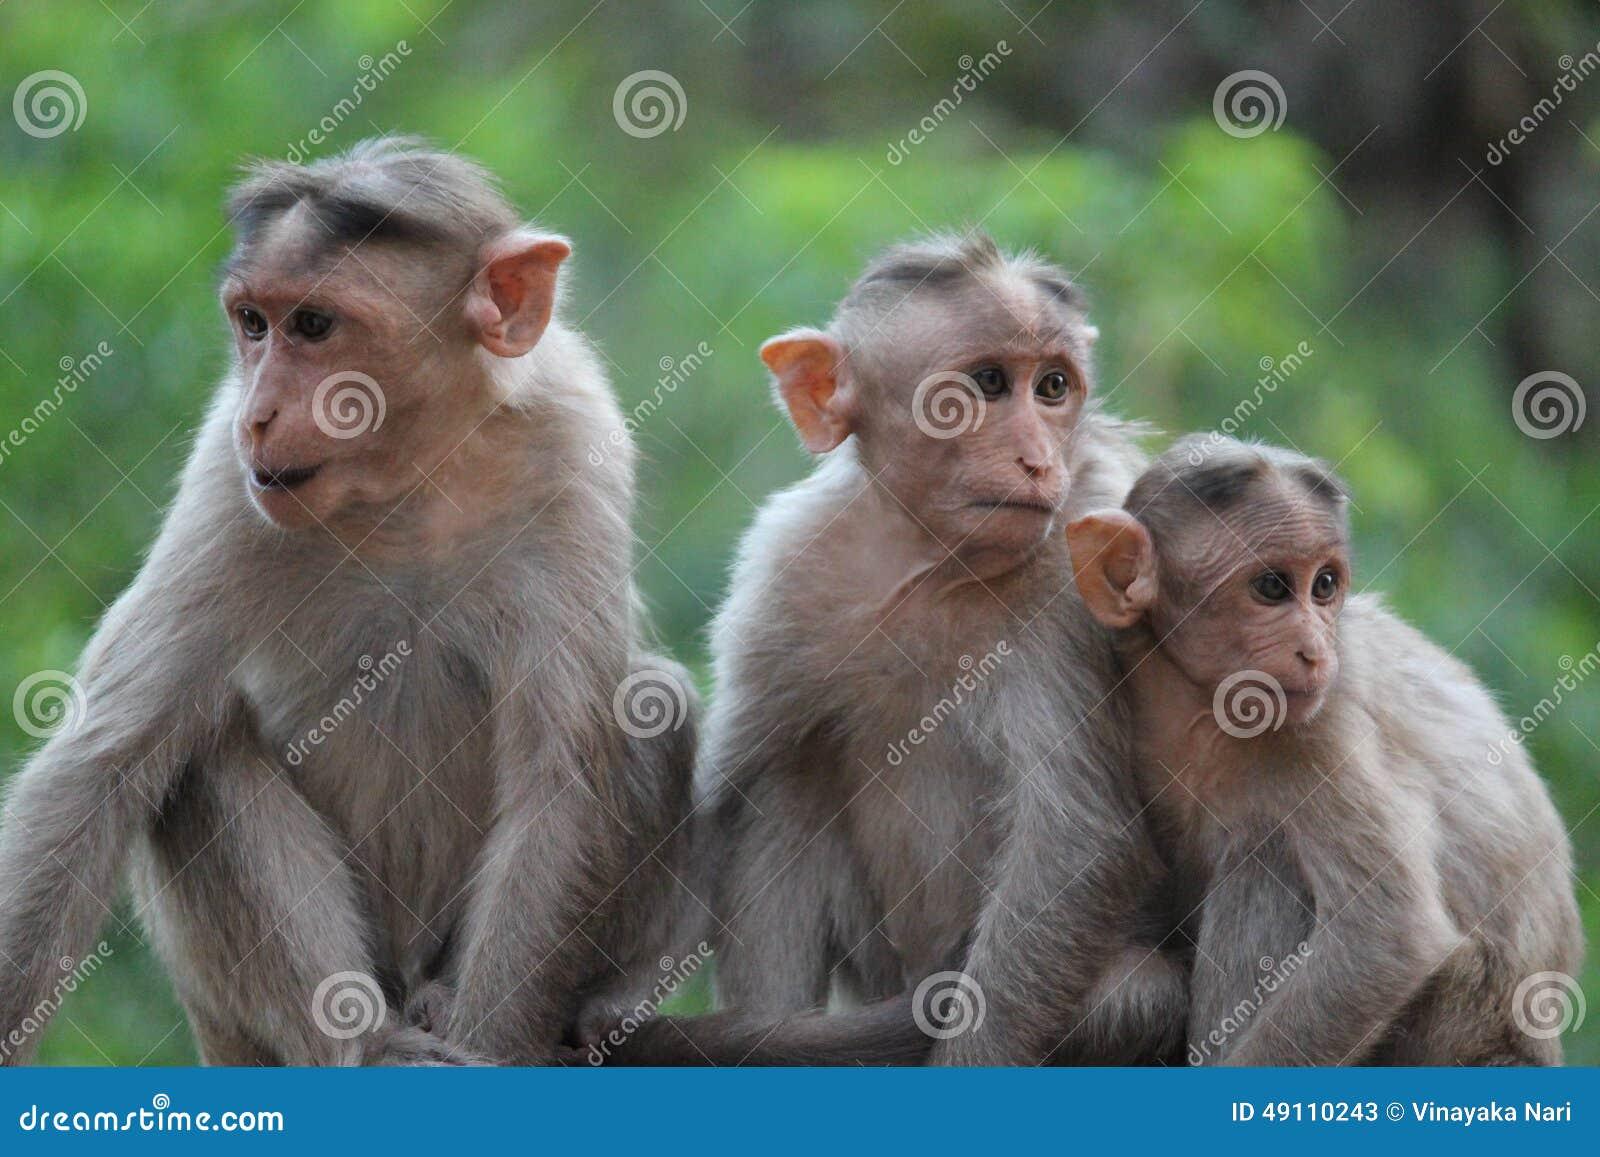 Monkeys team